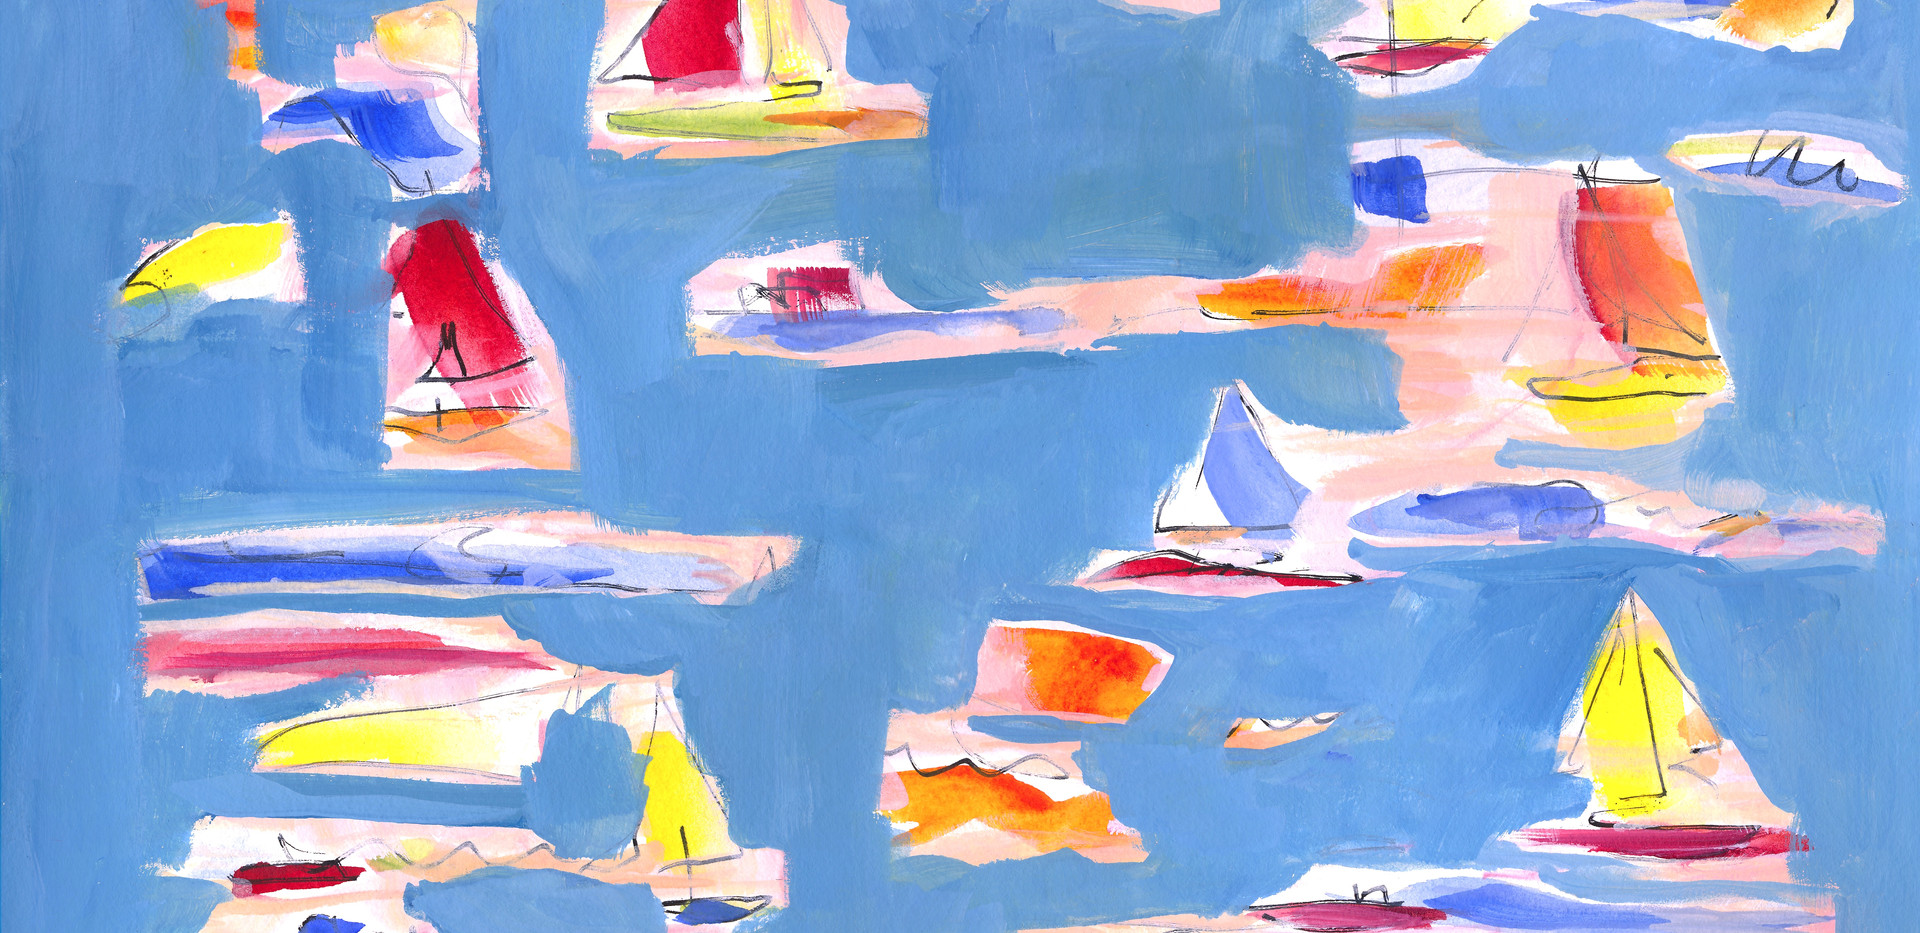 Rising Tide Lifting All Boats